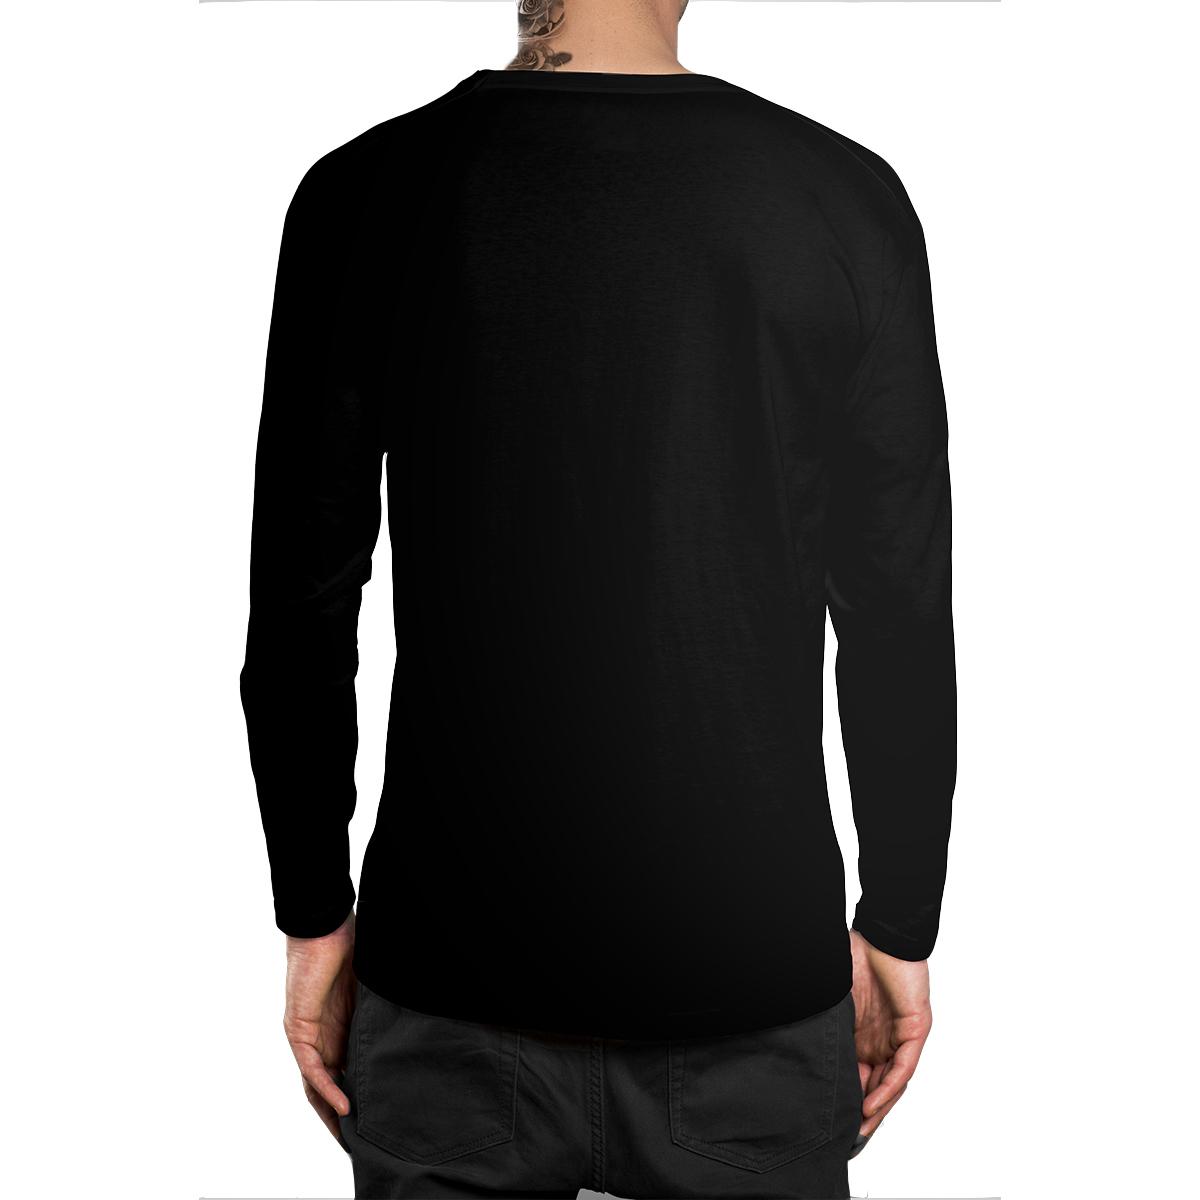 Stompy Camiseta Manga Longa Modelo 06